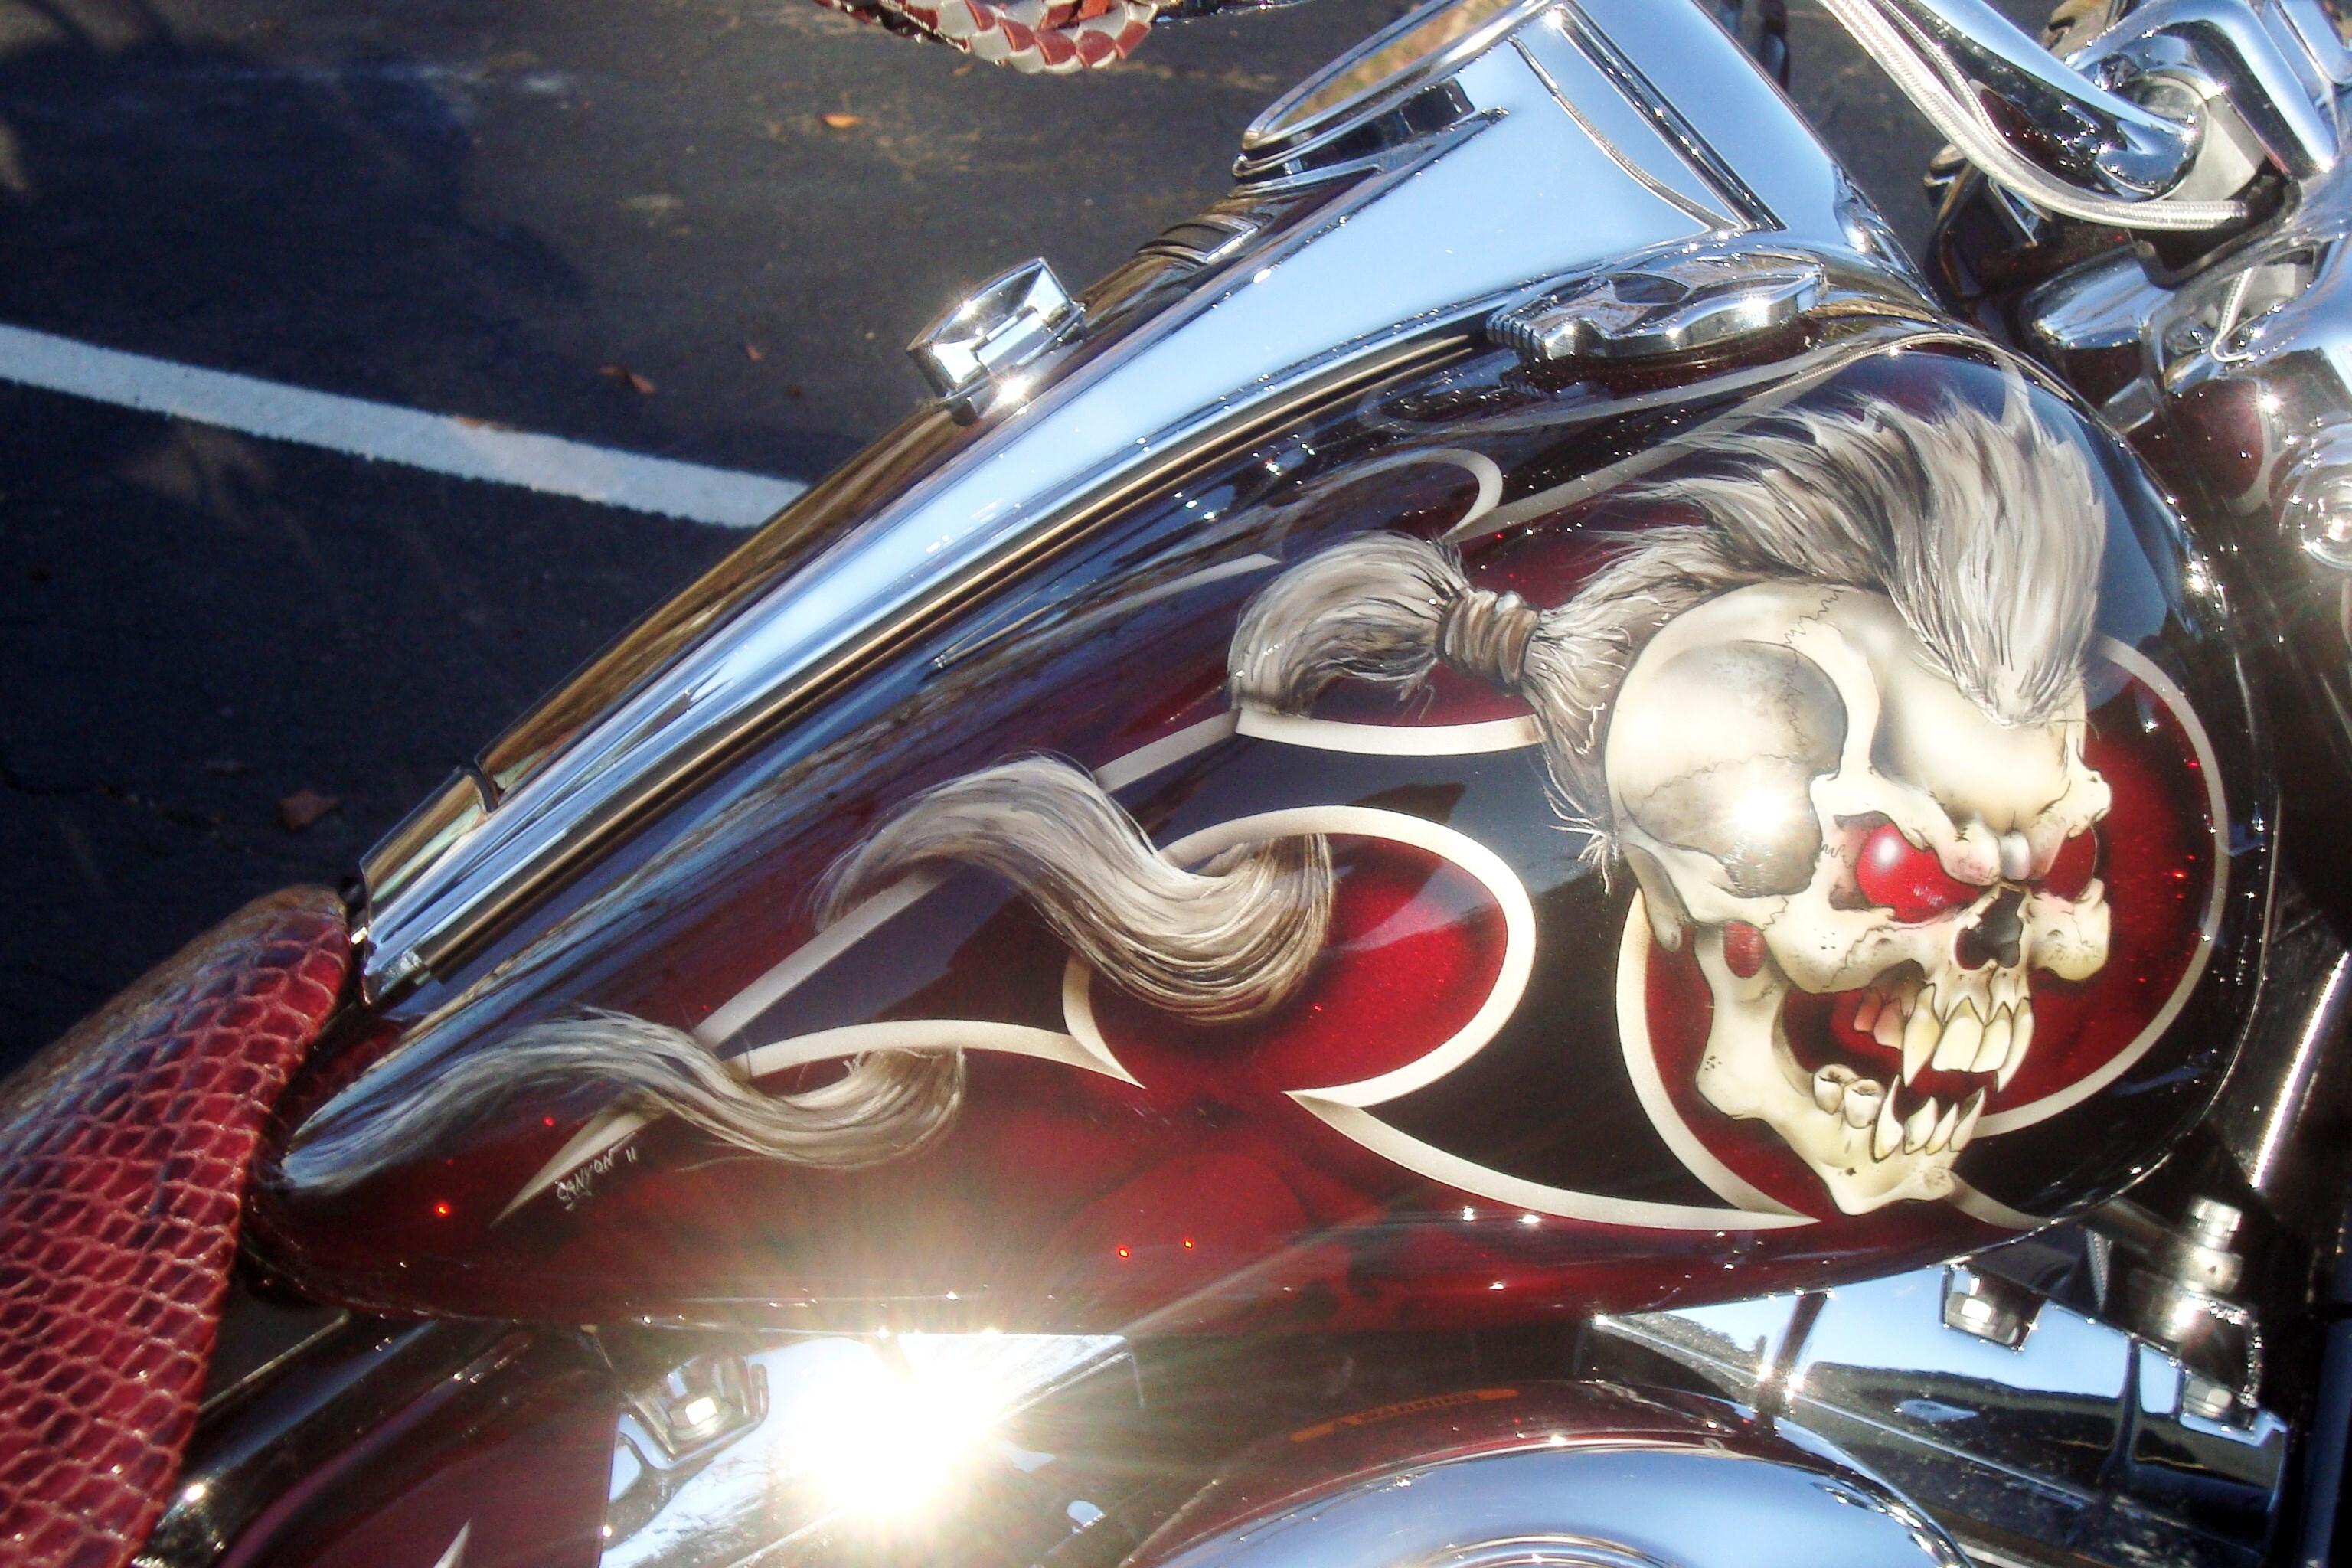 2009 Harley Davidson 174 Flhrc Road King 174 Classic Dark